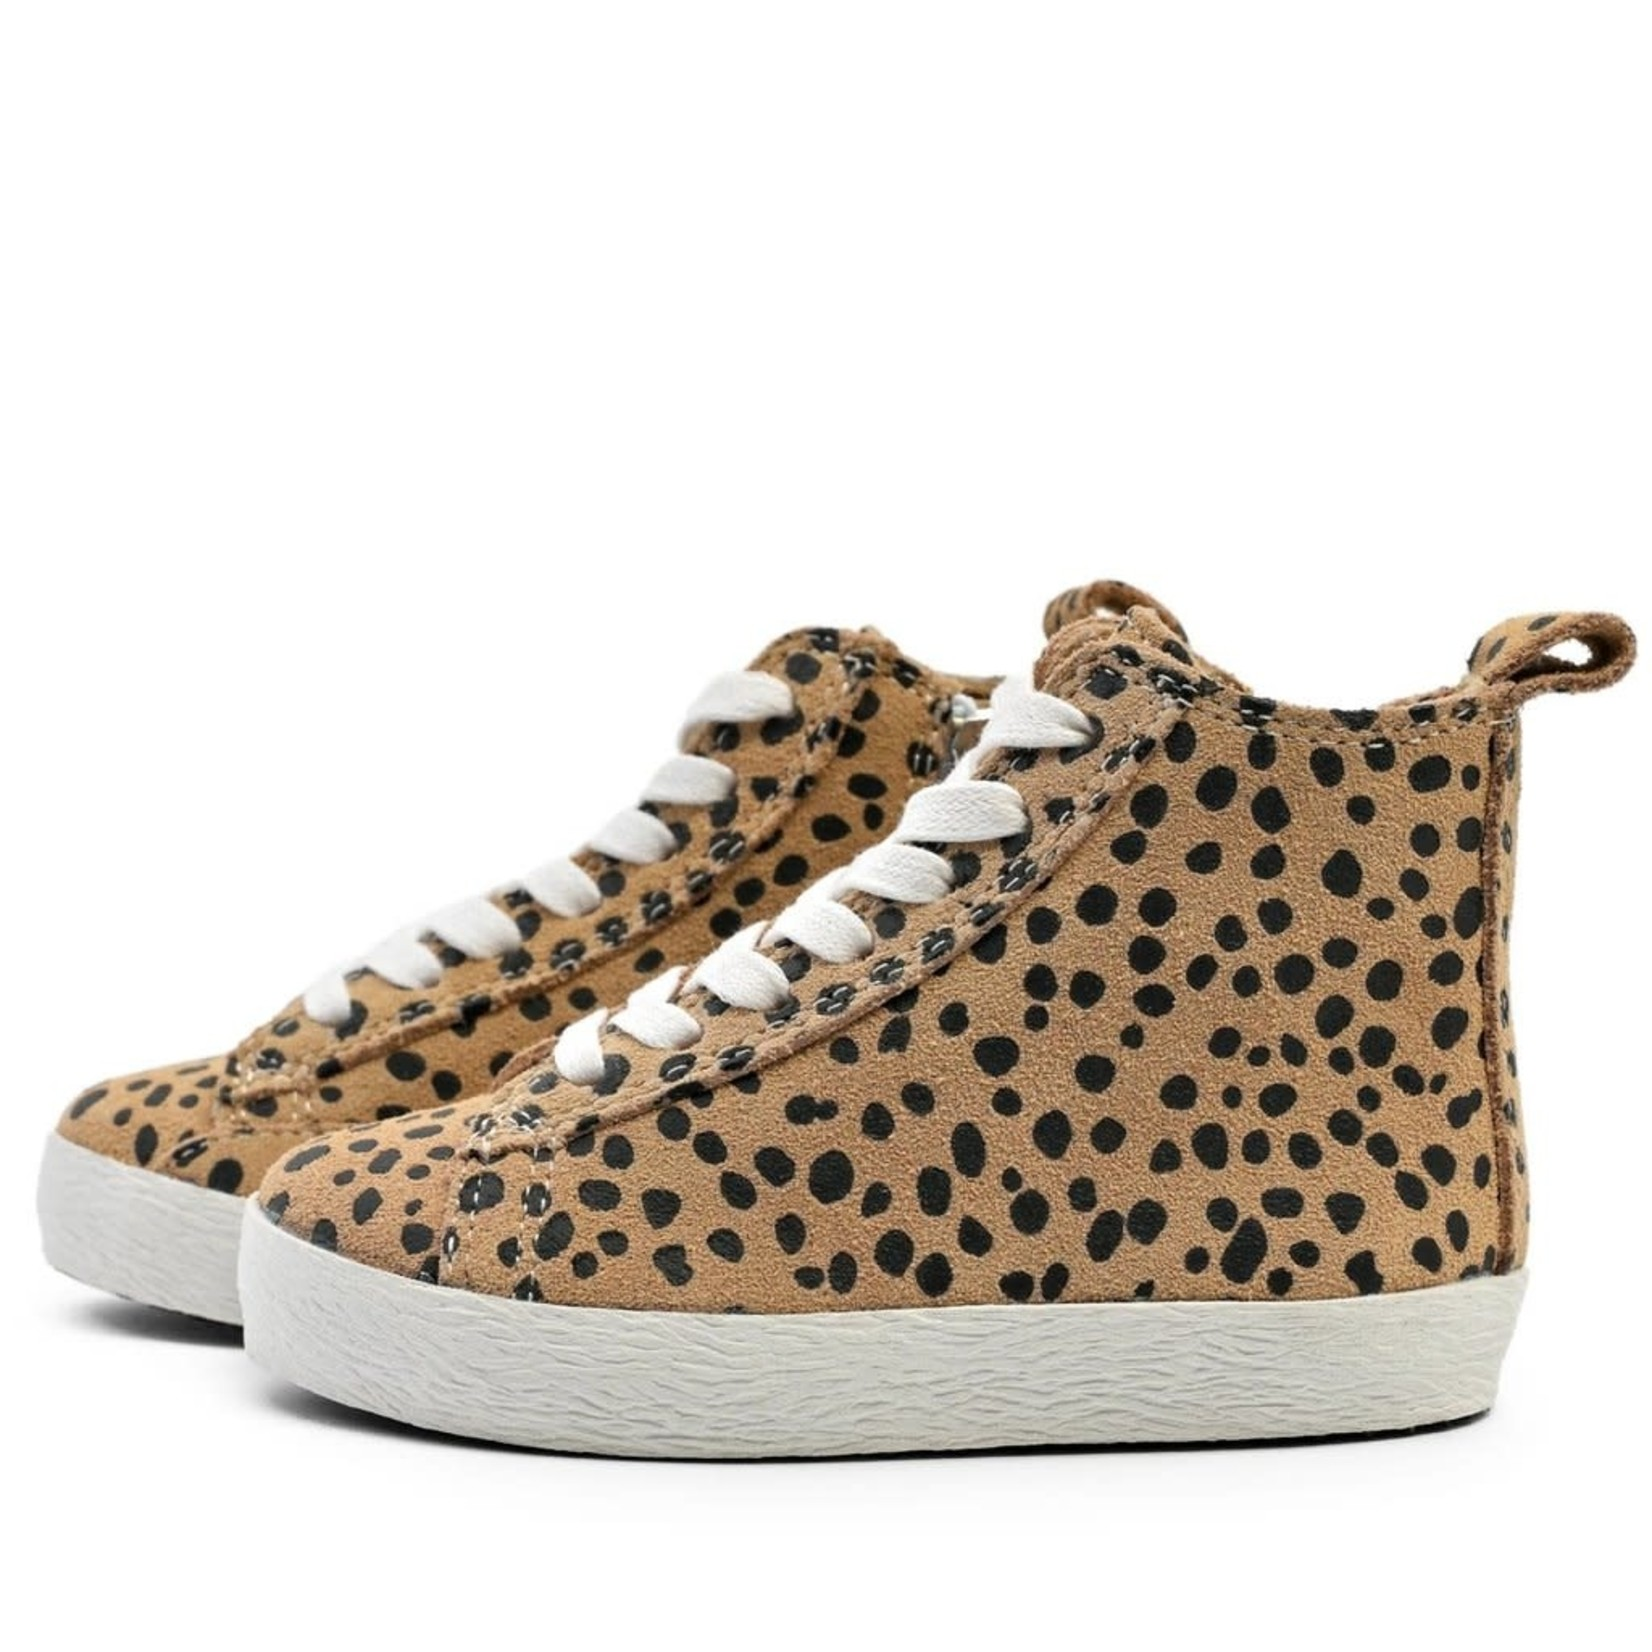 High Top Sneakers - Cheetah